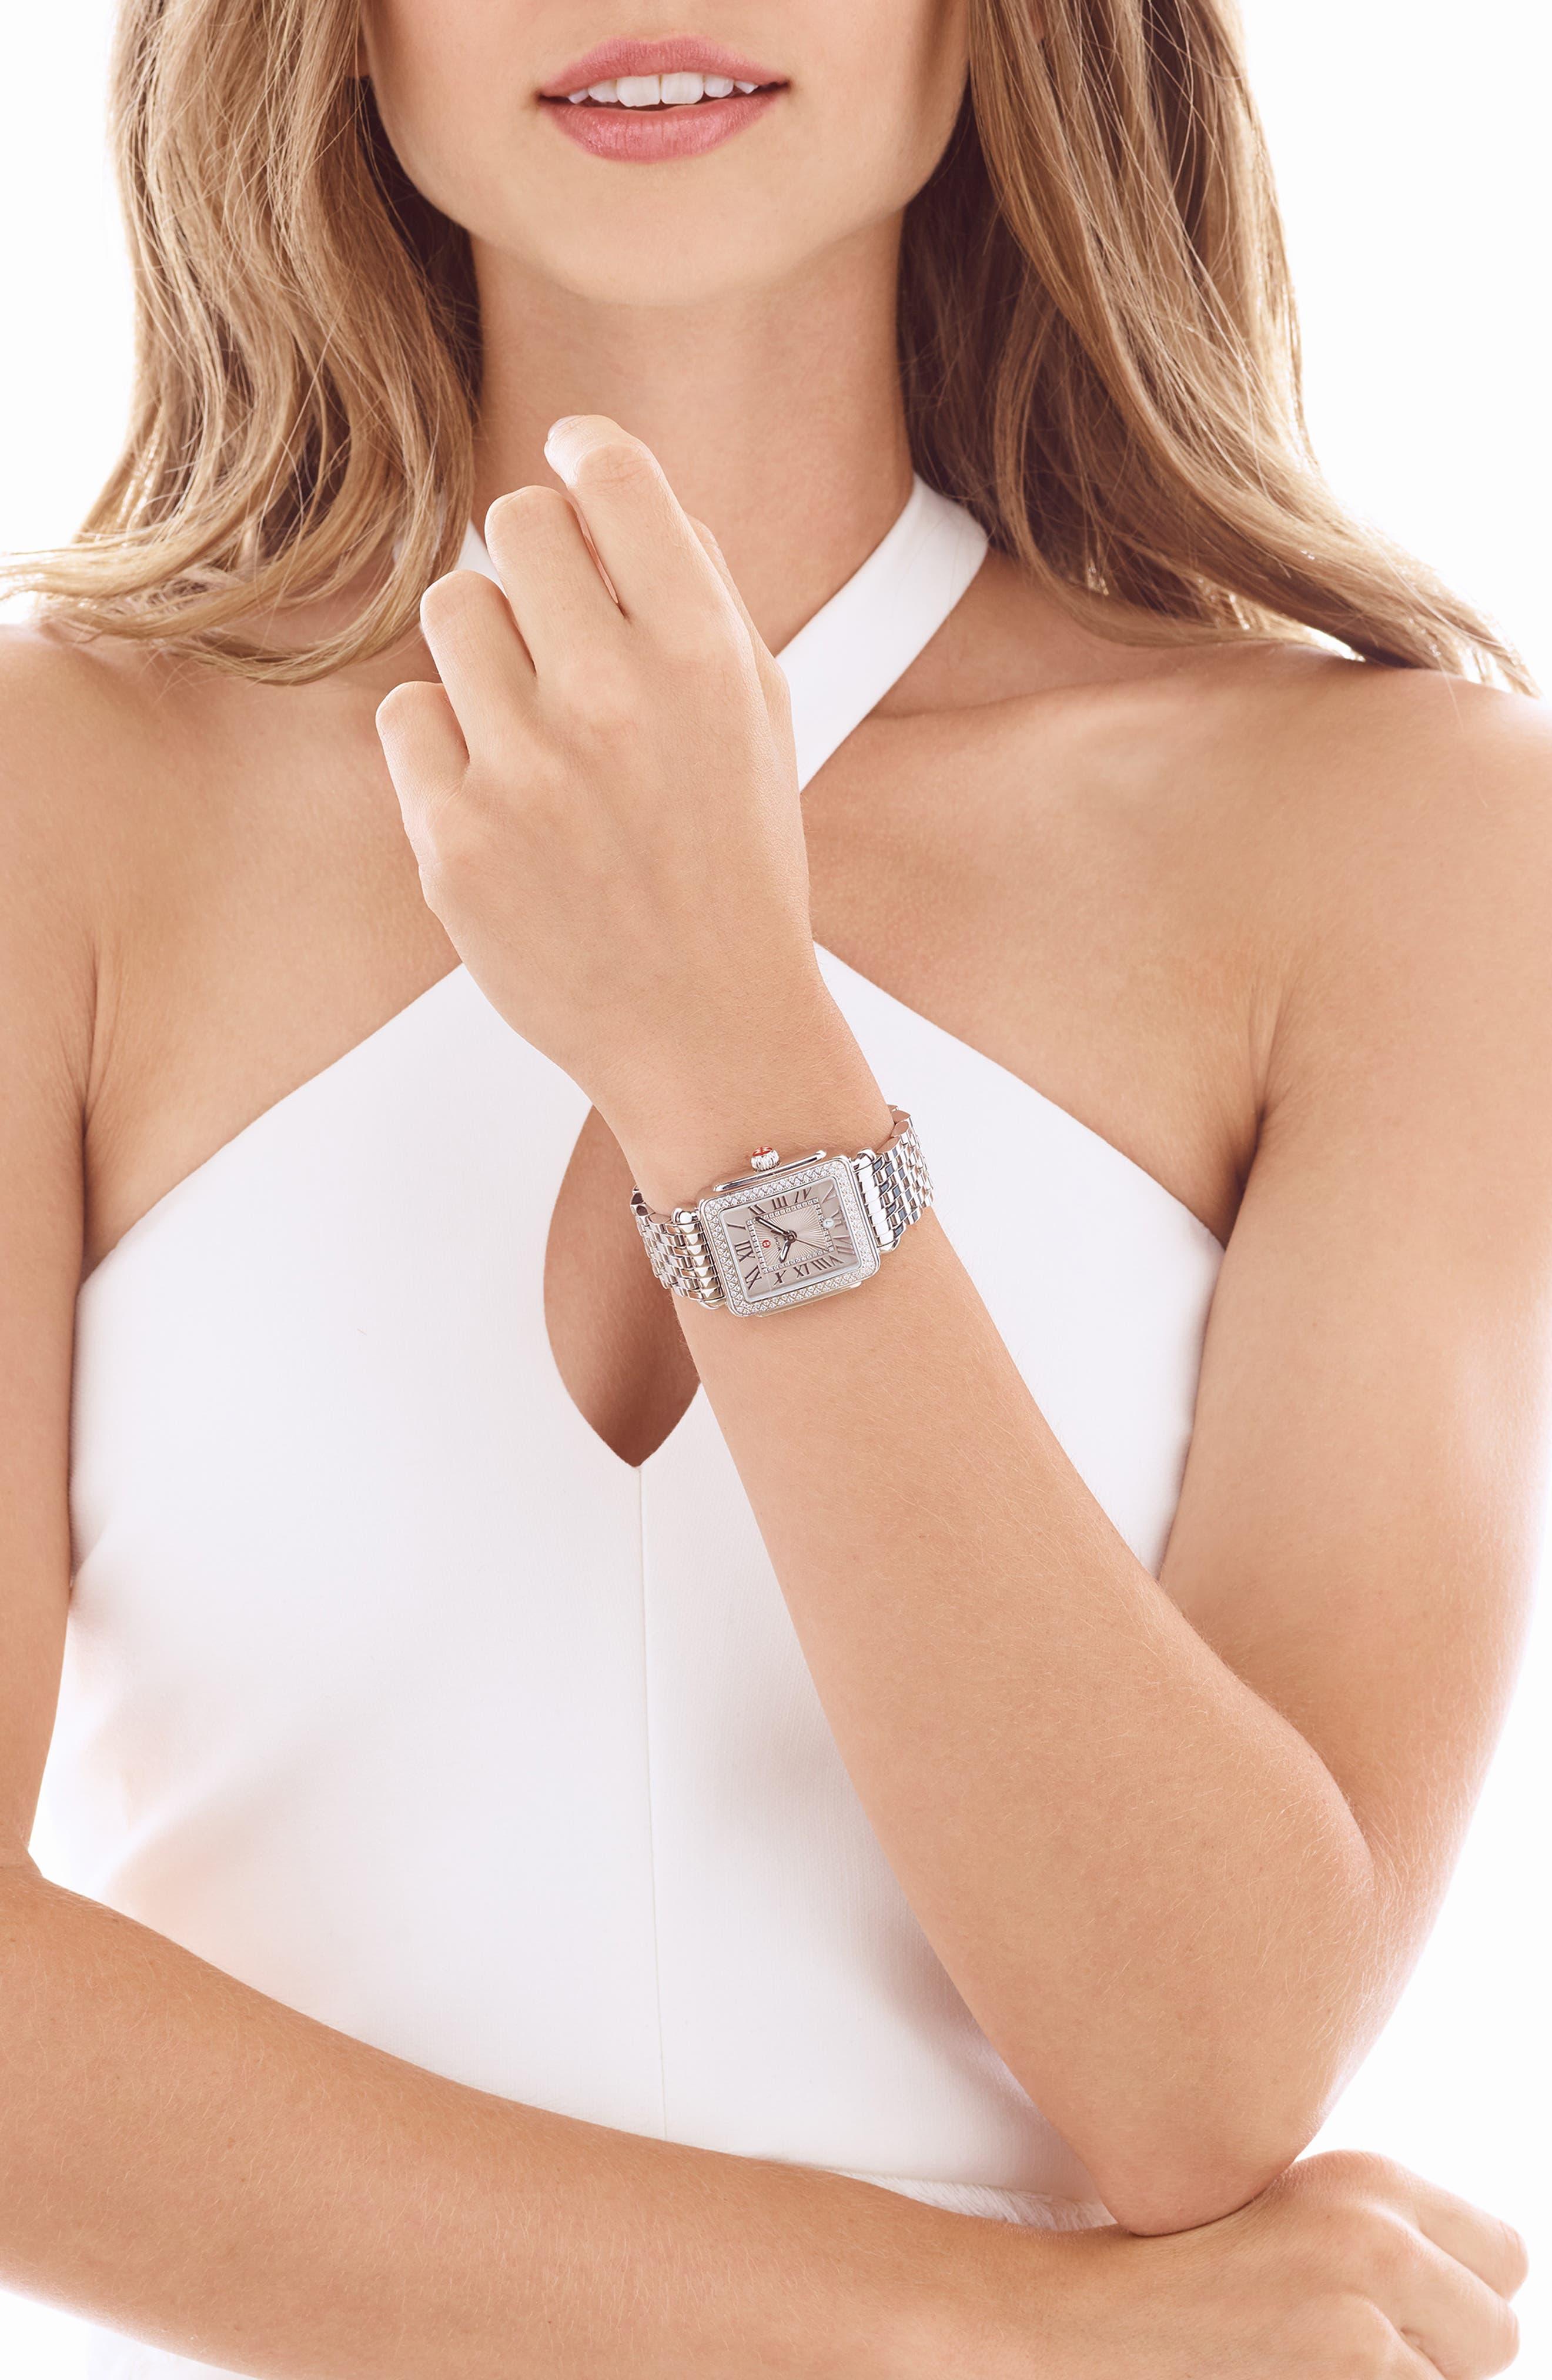 Deco 16 16mm Bracelet Watchband,                             Alternate thumbnail 10, color,                             SILVER